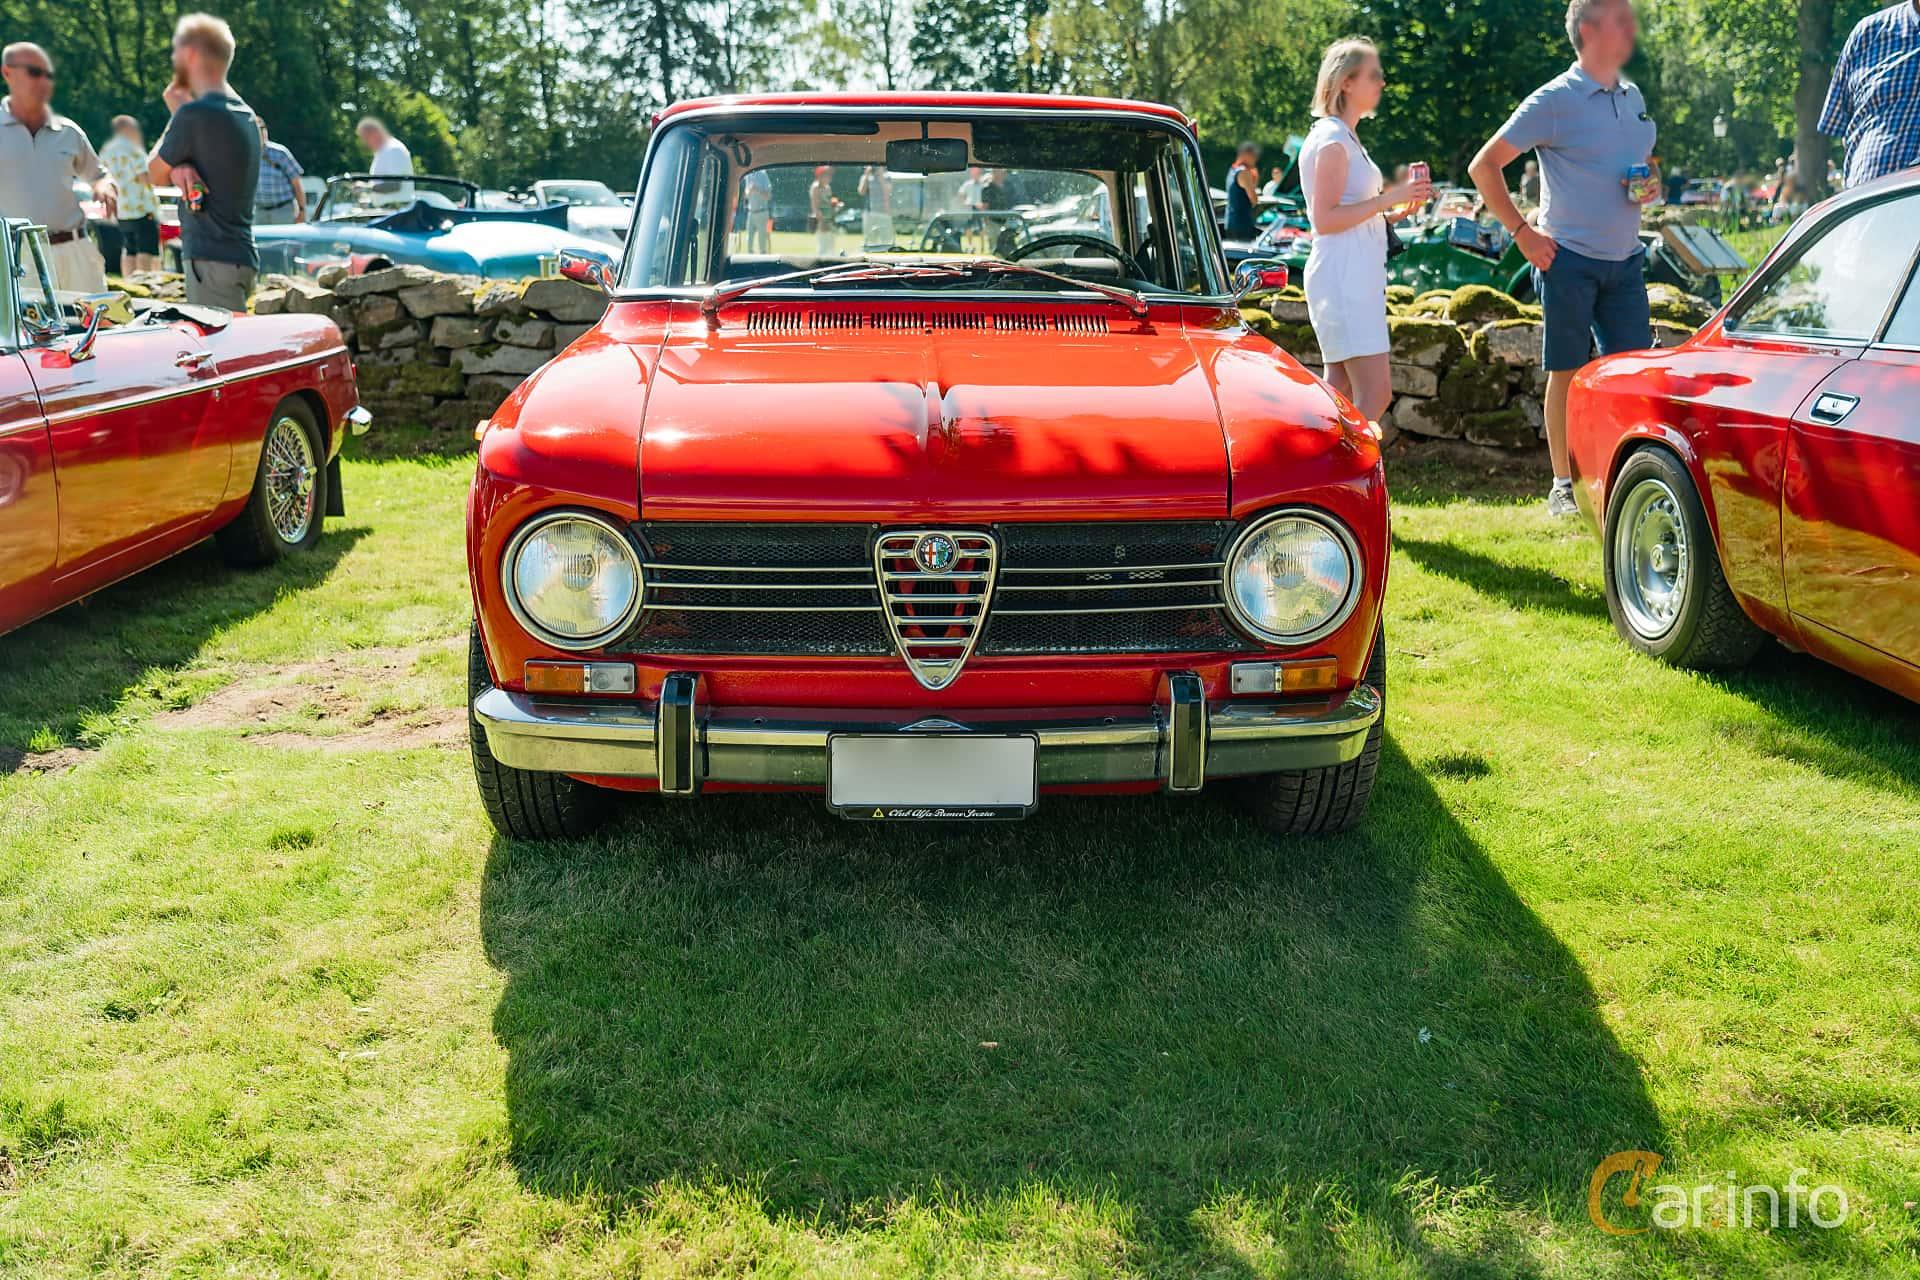 Front  of Alfa Romeo Giulia 1300 Ti 1.3 Manual, 83ps, 1969 at Sportbilsklassiker Stockamöllan 2019